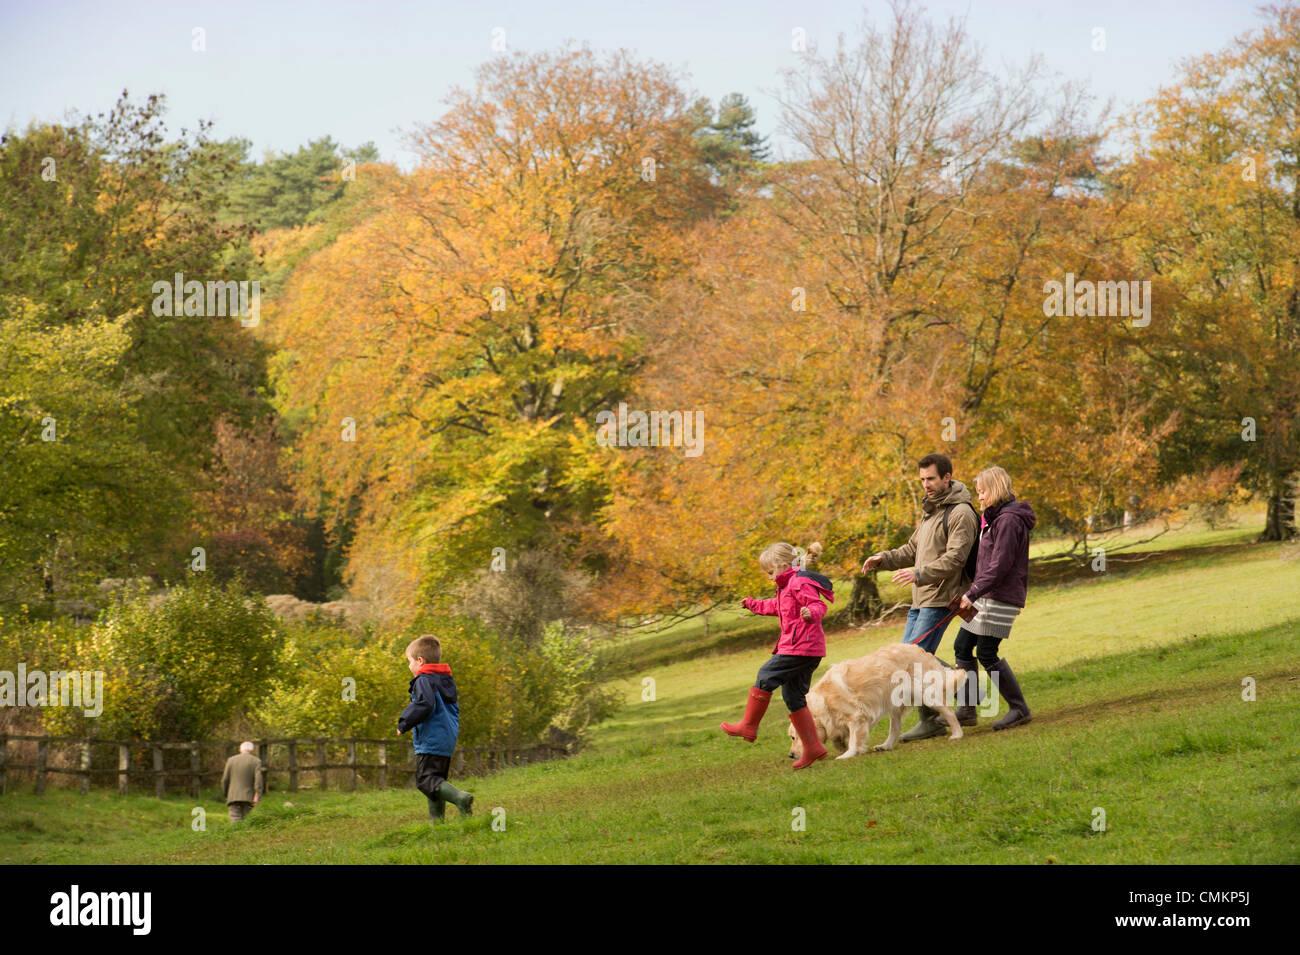 Autumn colour at Westonbirt Arboretum, Gloucestershire (2 Nov 2013). Credit:  Adrian Sherratt/Alamy Live News - Stock Image